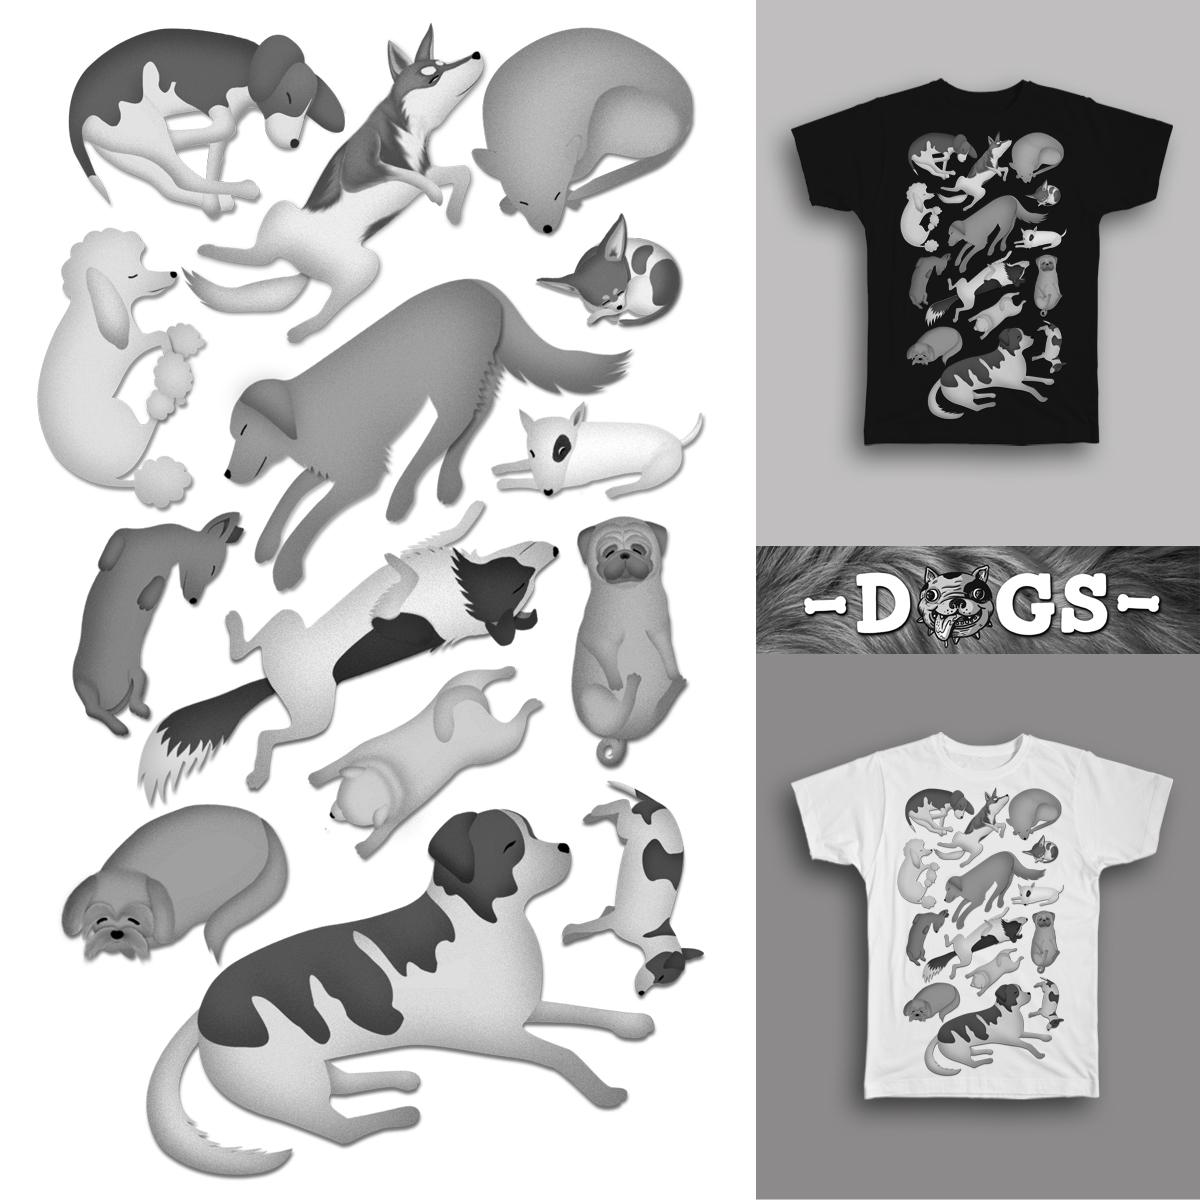 Sleeping Dogs 101 by farlyfs on Threadless